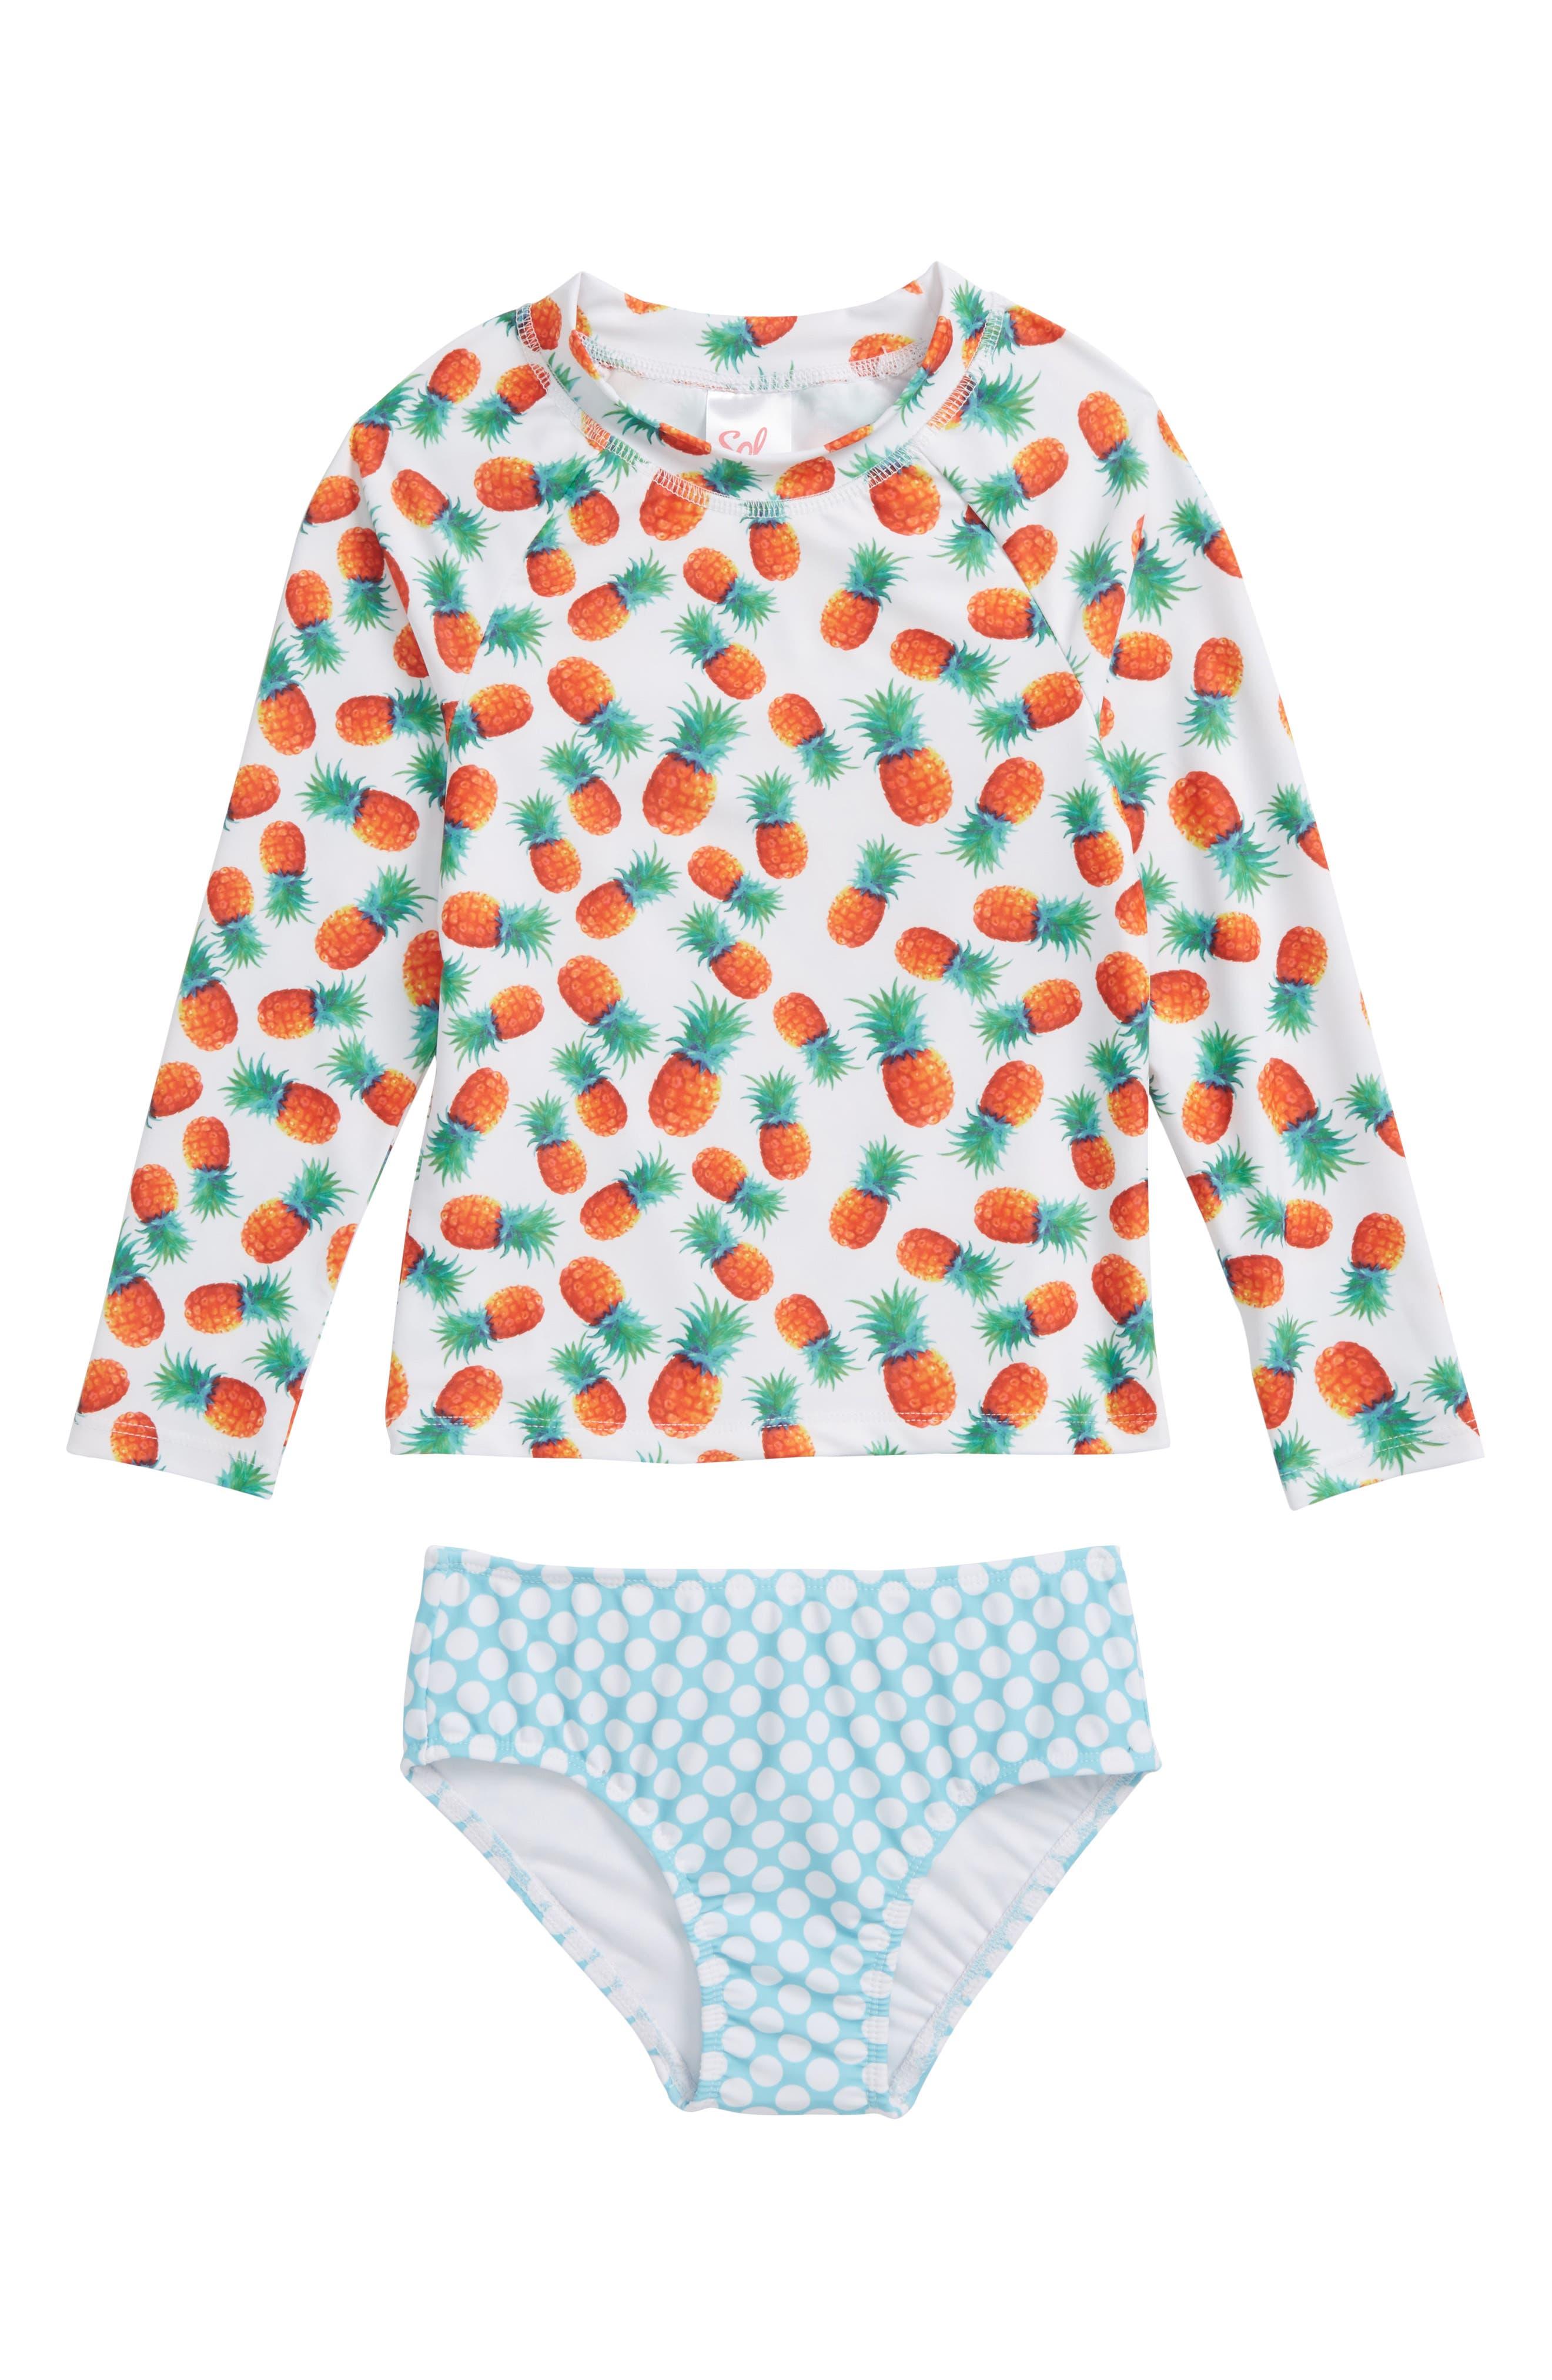 Alternate Image 1 Selected - Sol Swim Pineapple Disco Two-Piece Rashguard Swimsuit (Toddler Girls & Little Girls)